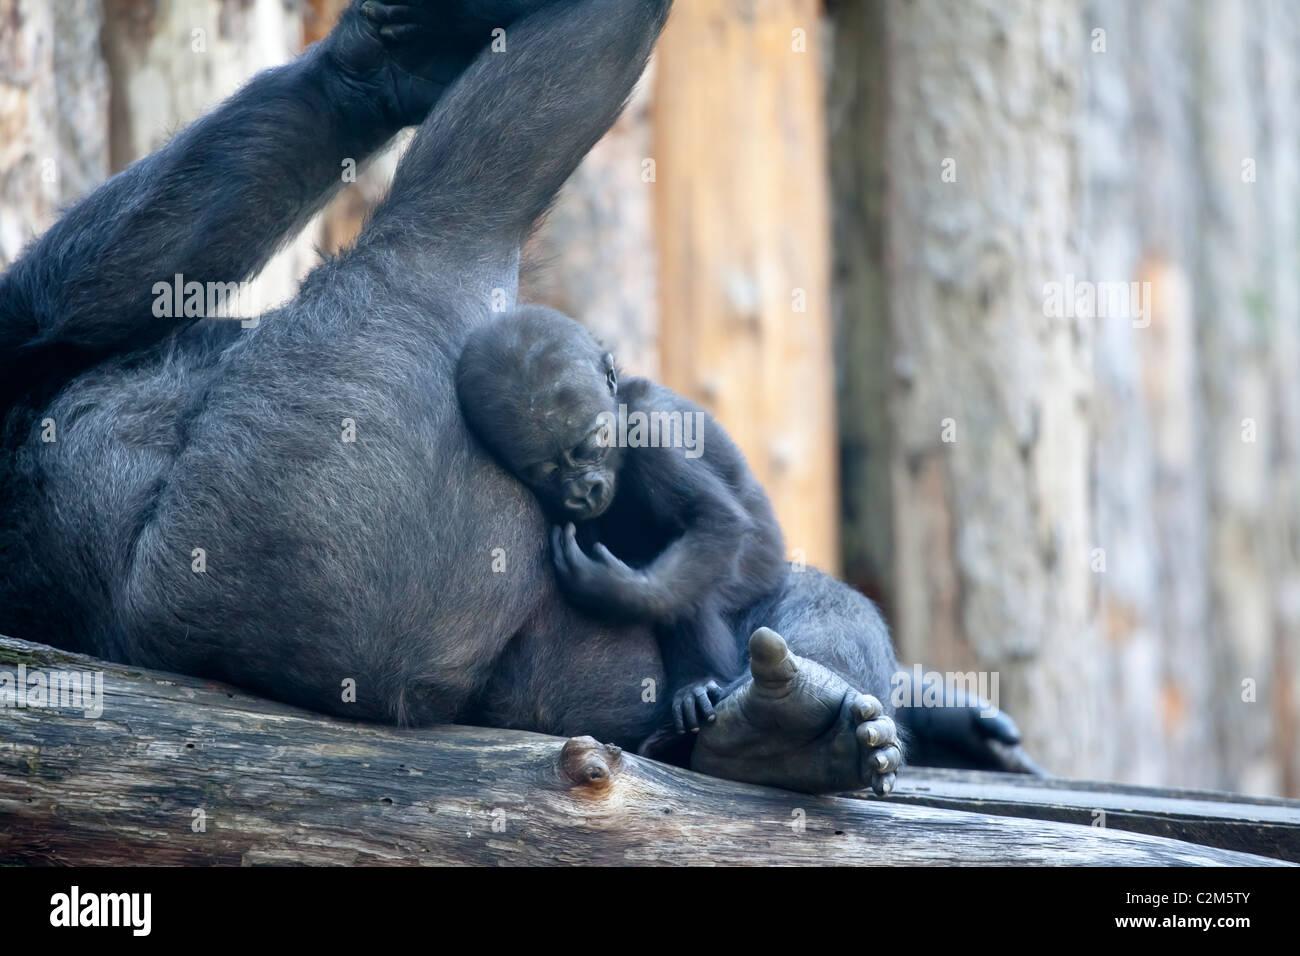 A gorilla with its newborn baby Cuddling it - Stock Image